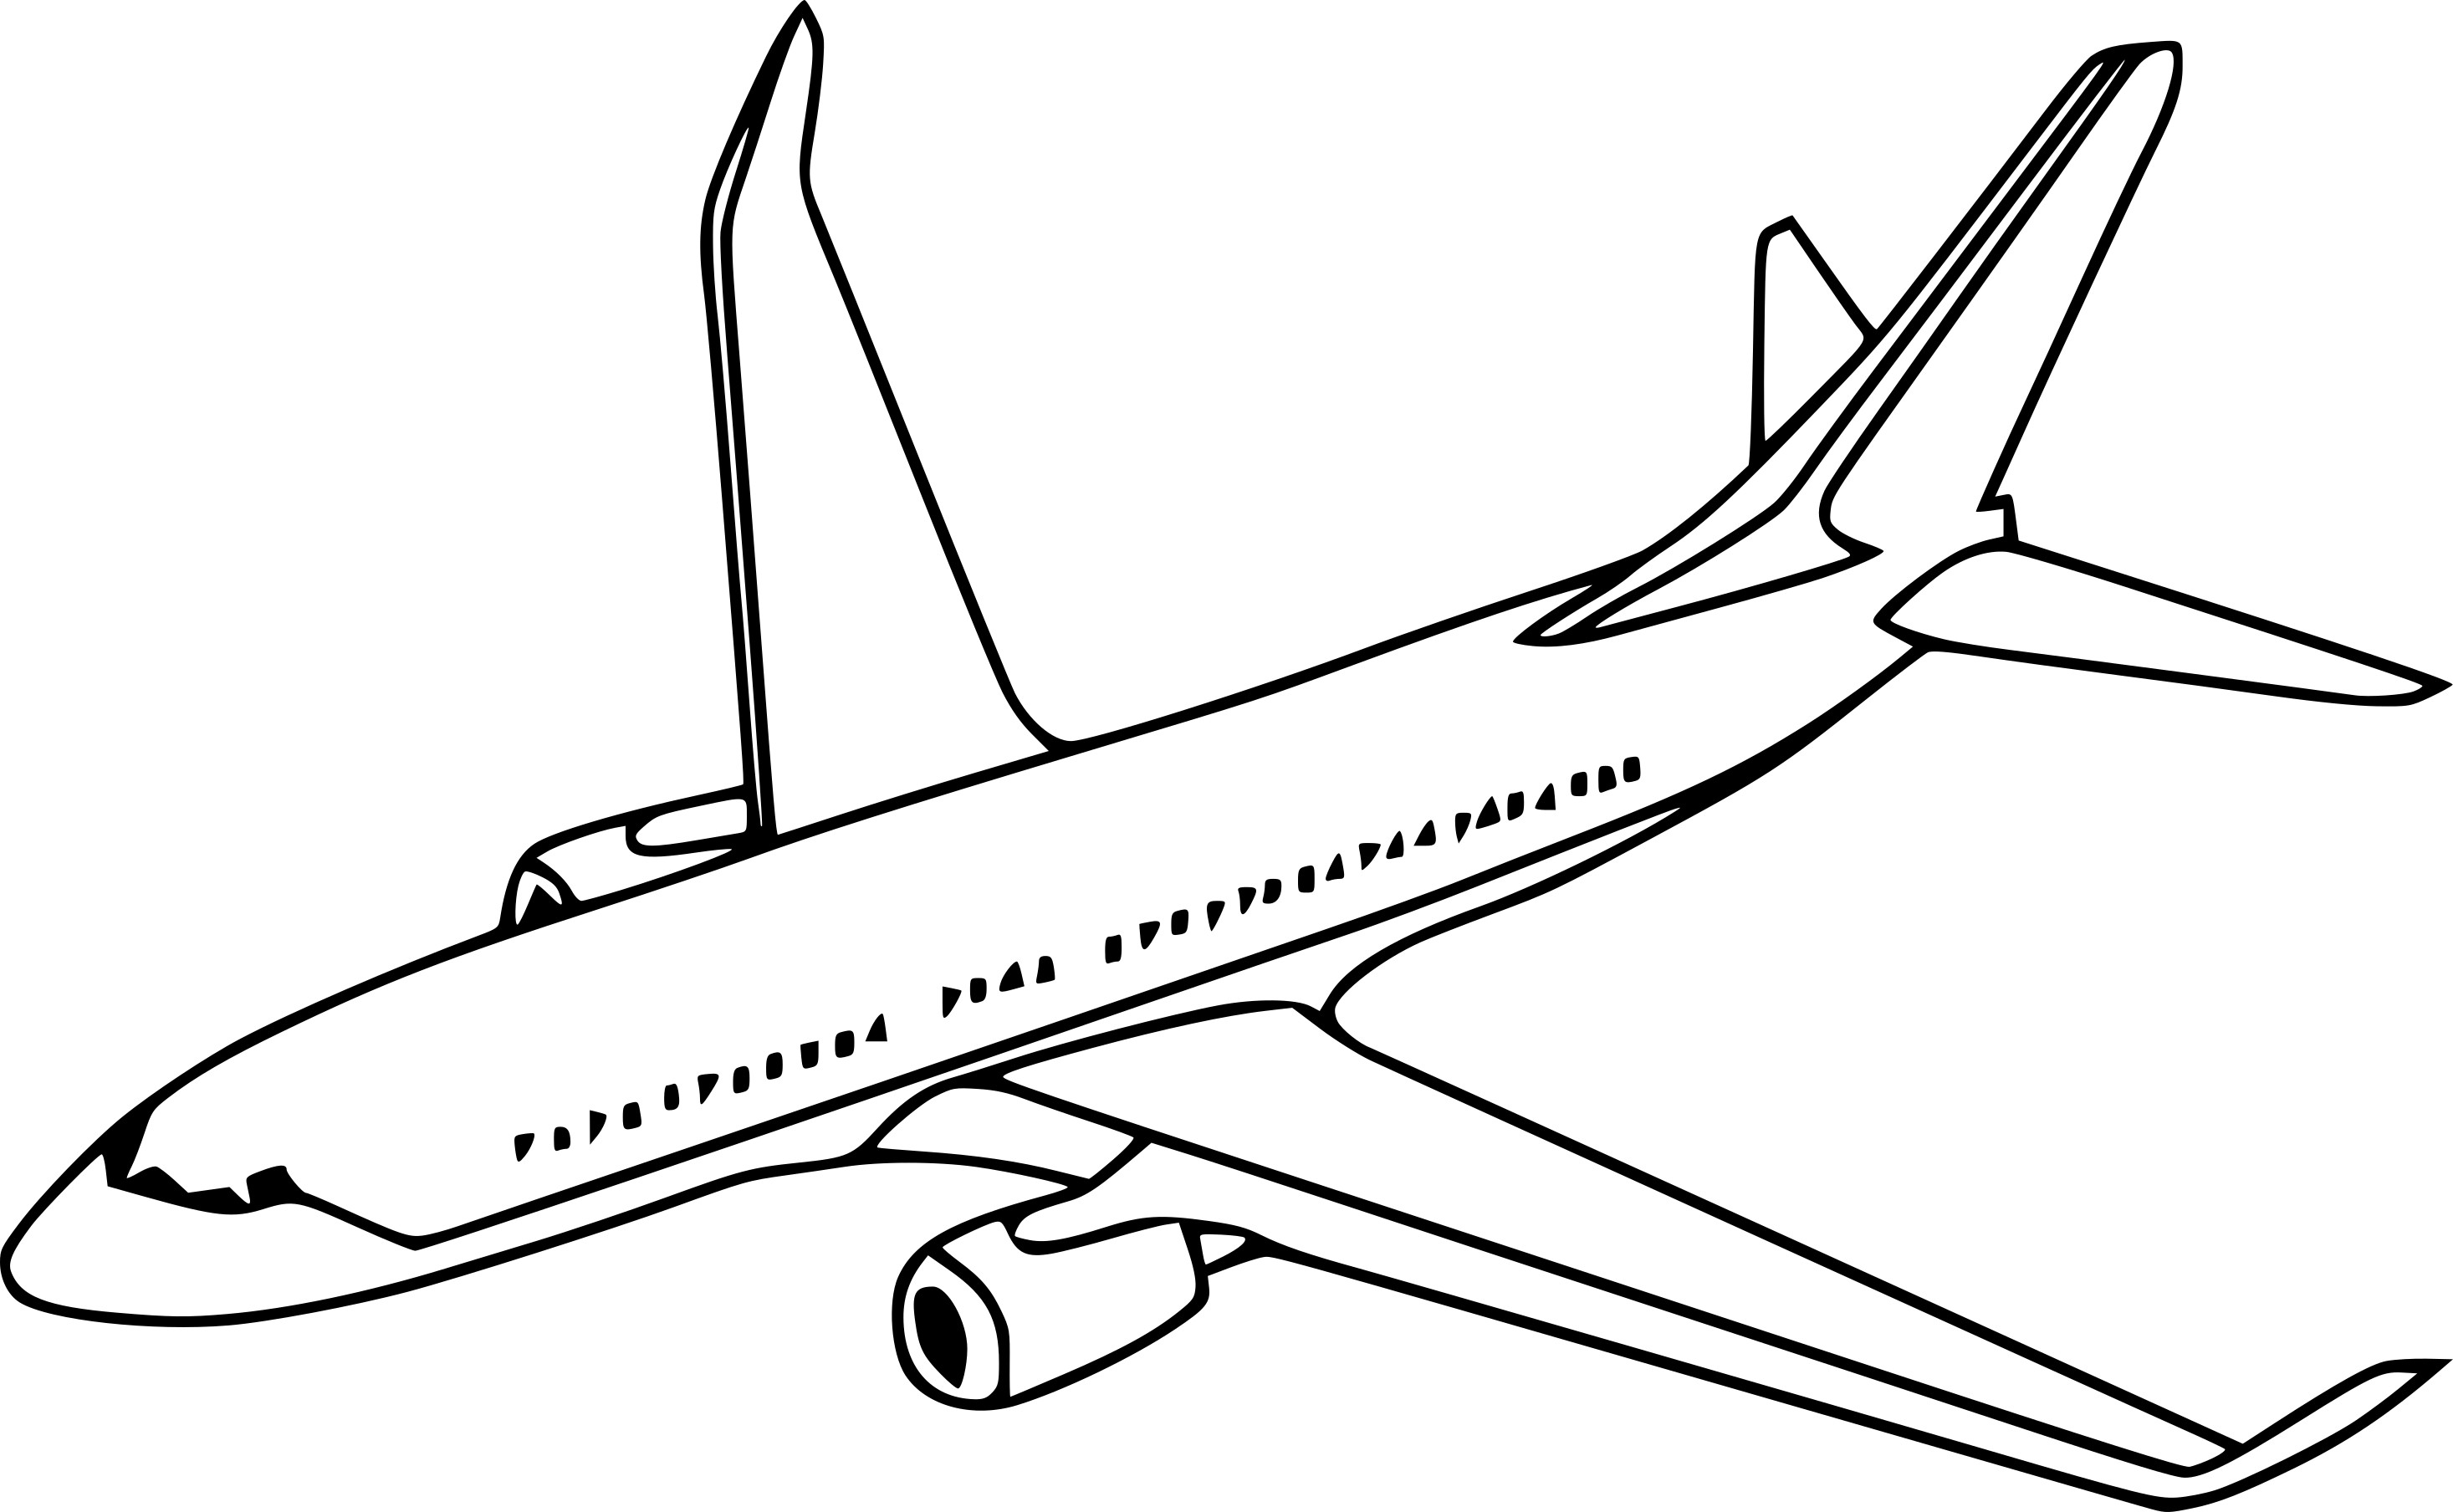 Coloriage avion gratuit imprimer - Dessin d avion facile ...